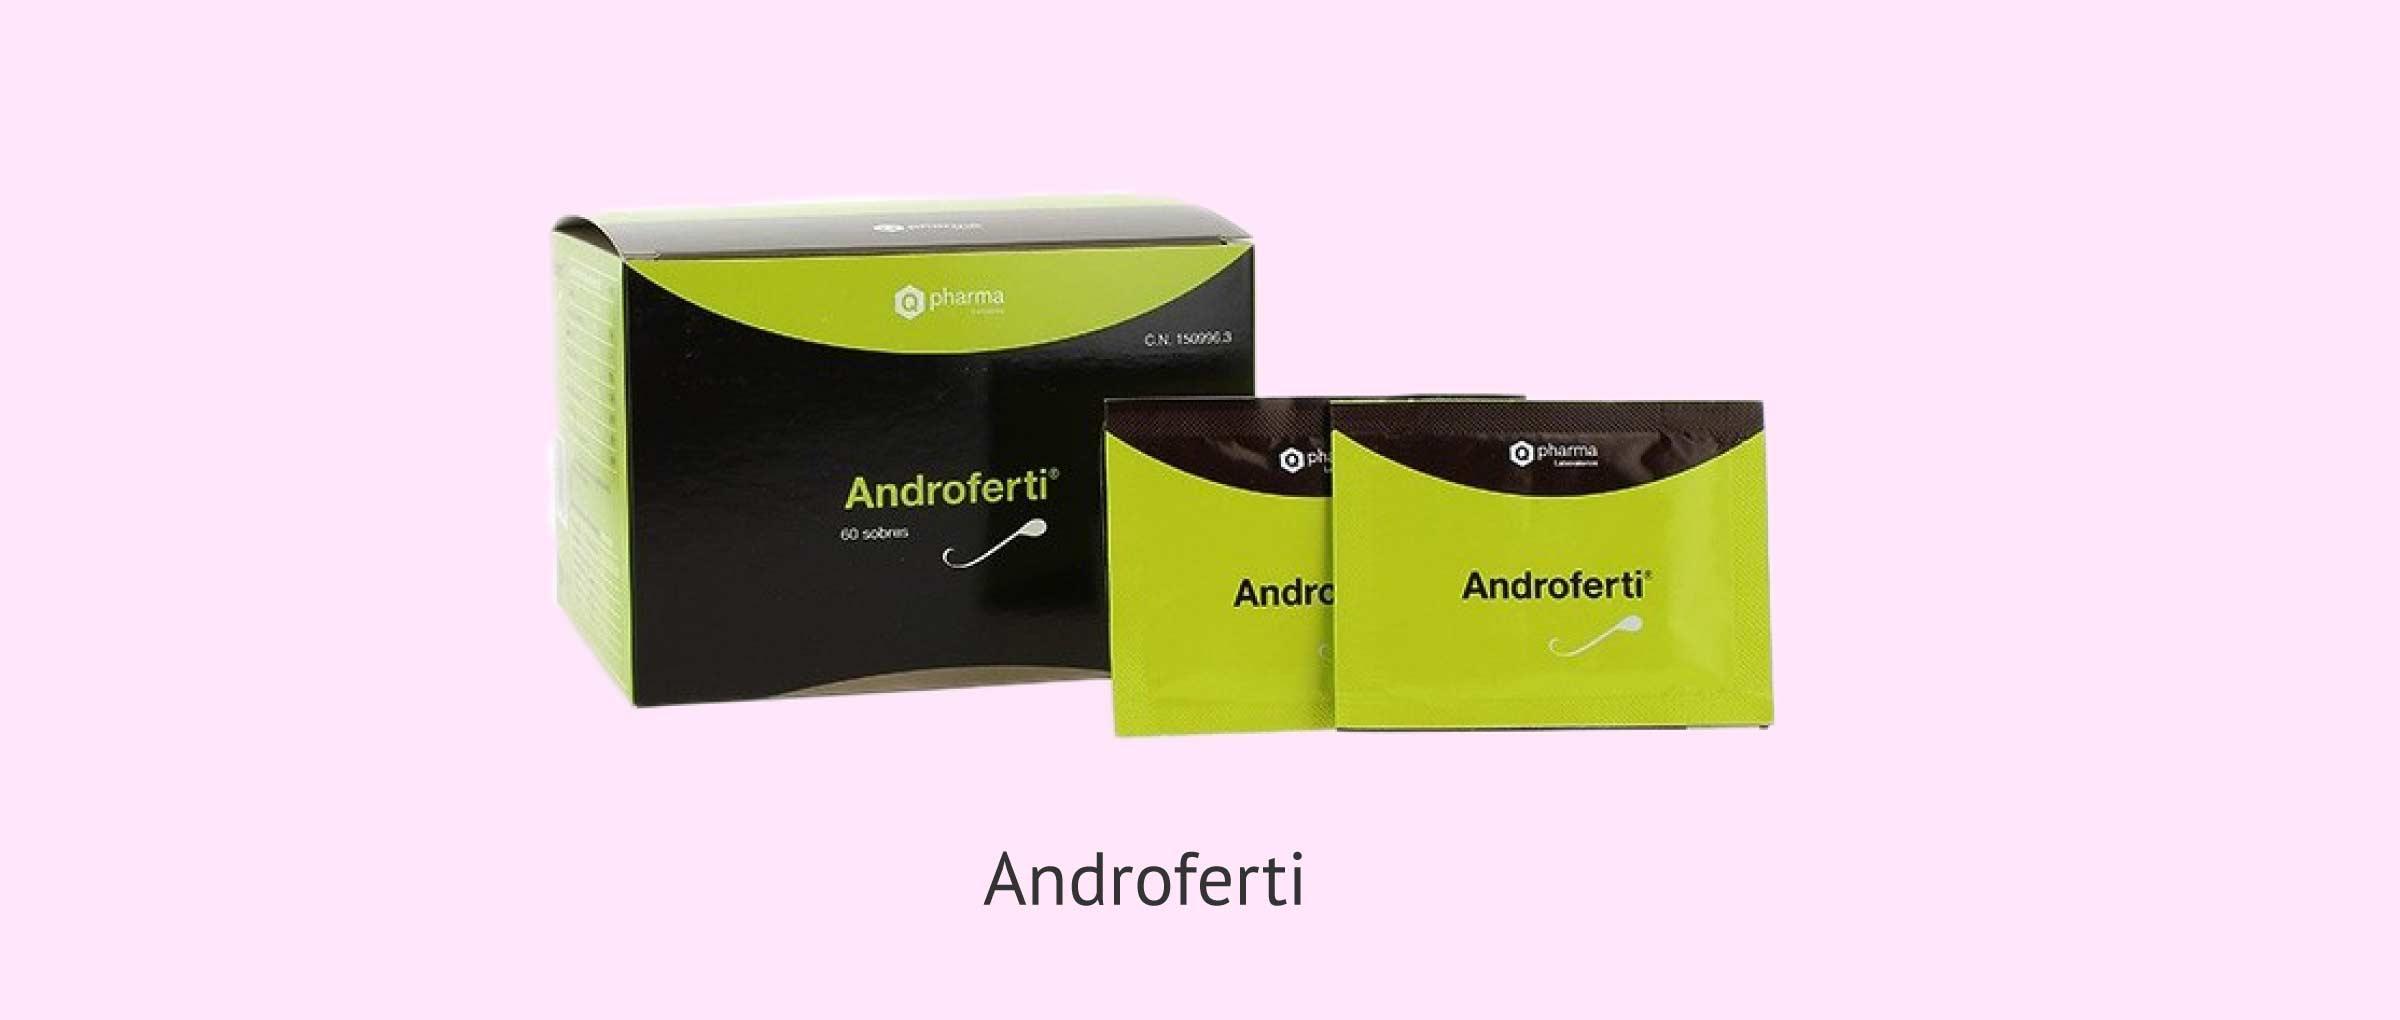 Androferti